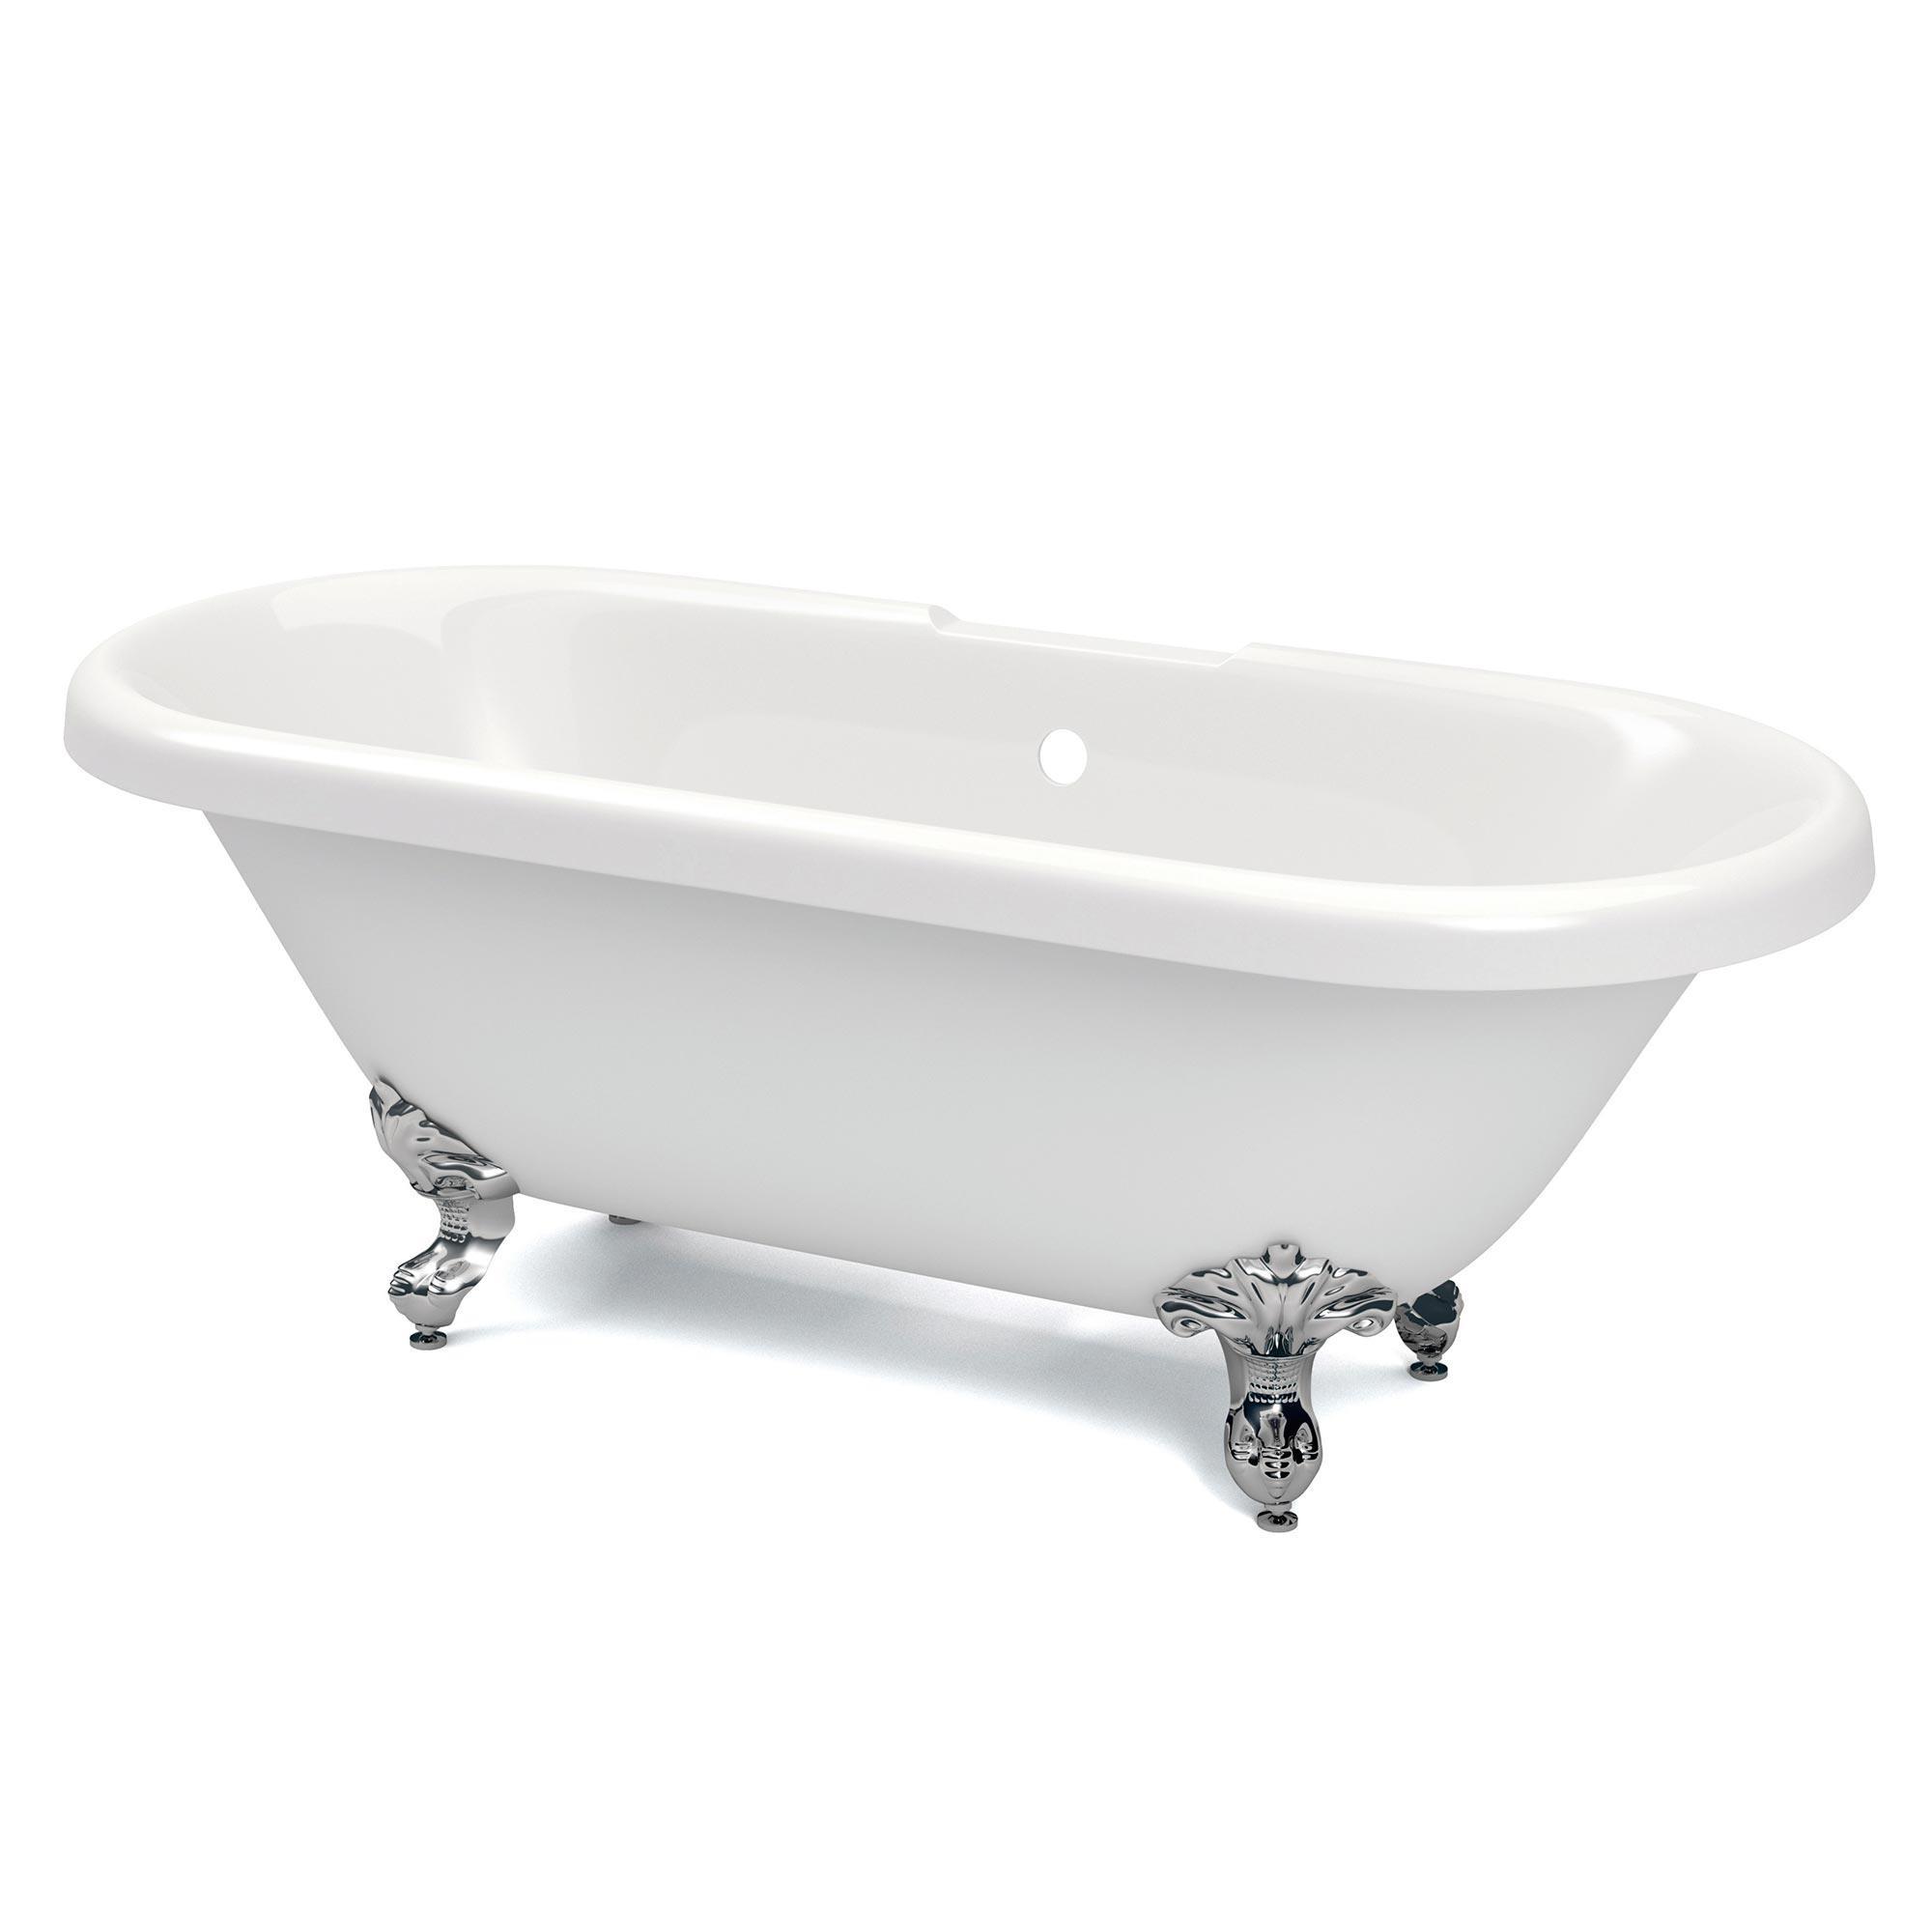 Richmond Traditional Freestanding Bath - White - Heat & Things